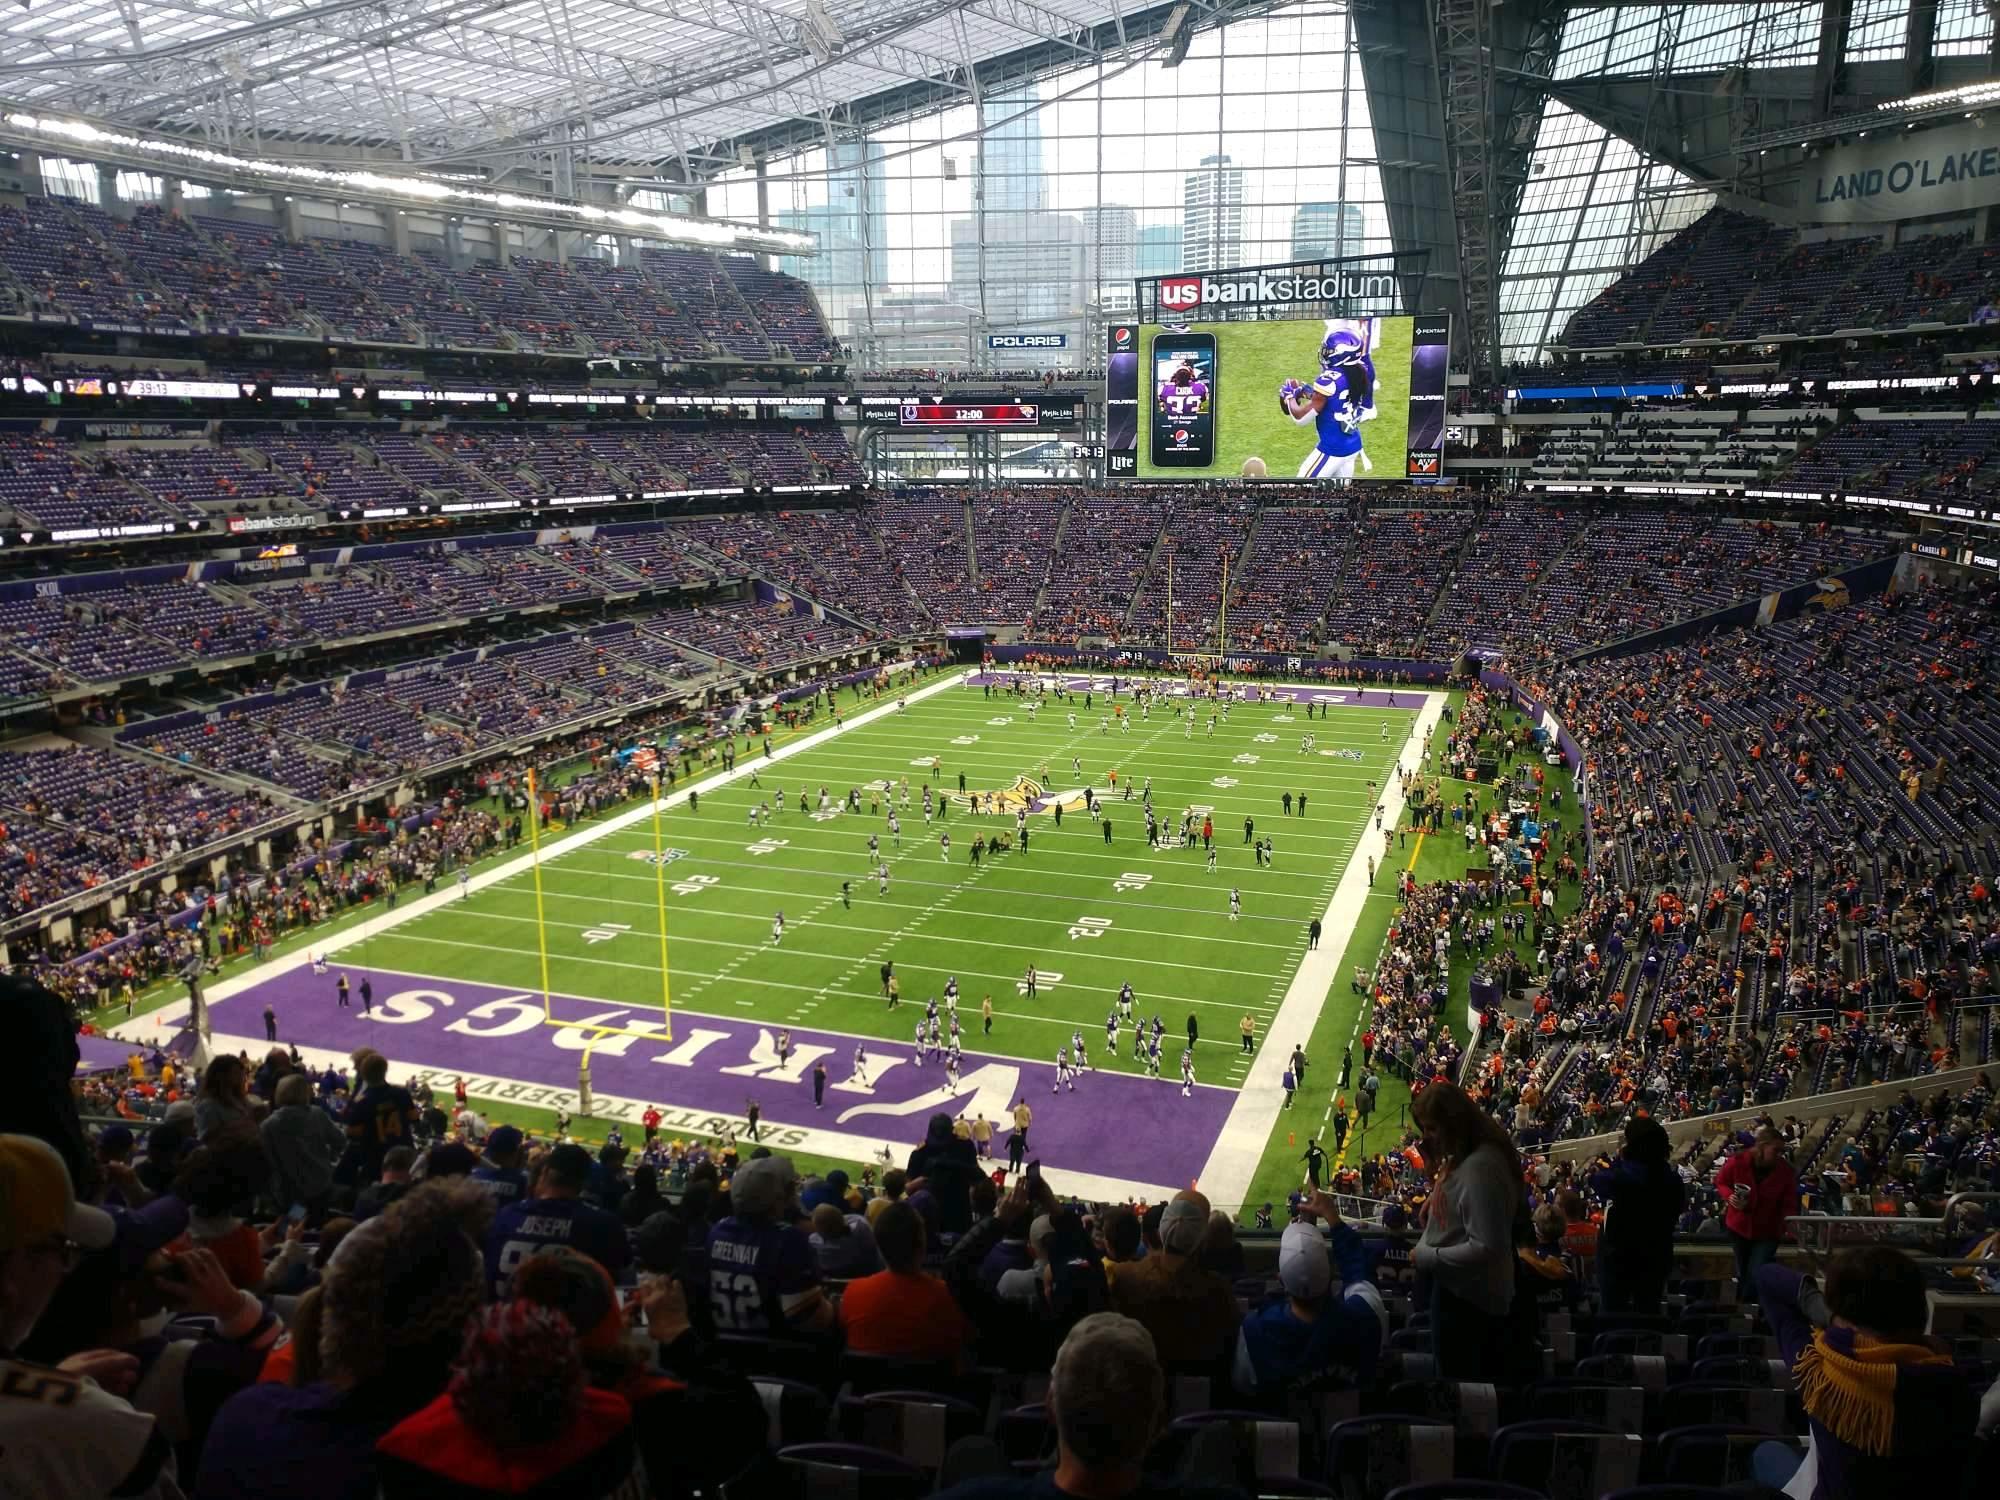 U.S. Bank Stadium Section 221 Row 14 Seat 12